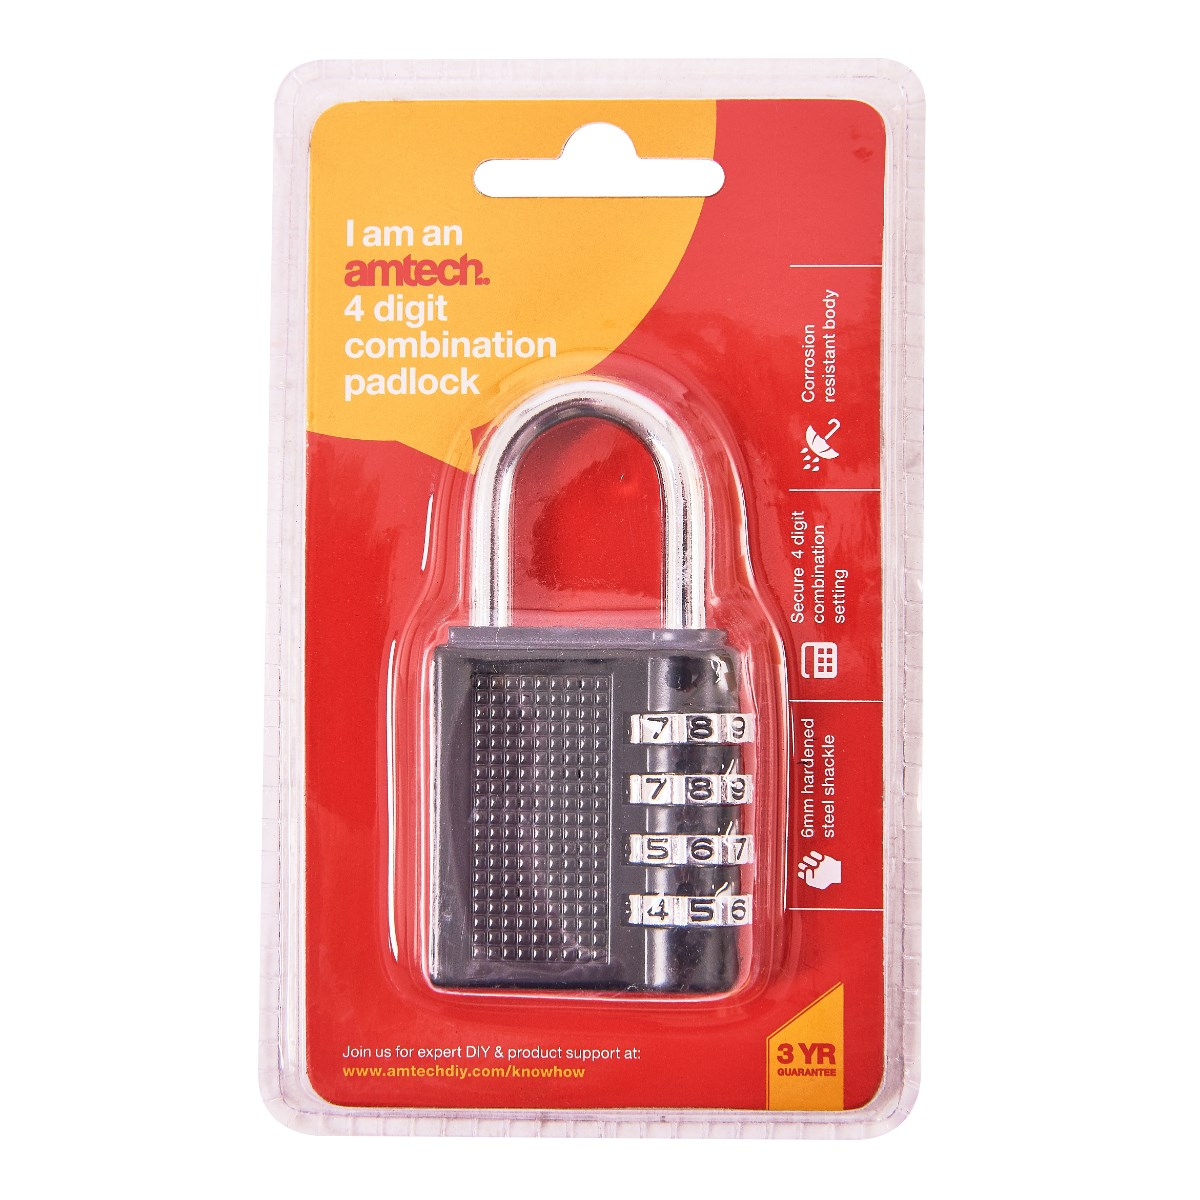 4 digit combination padlock - Amtech